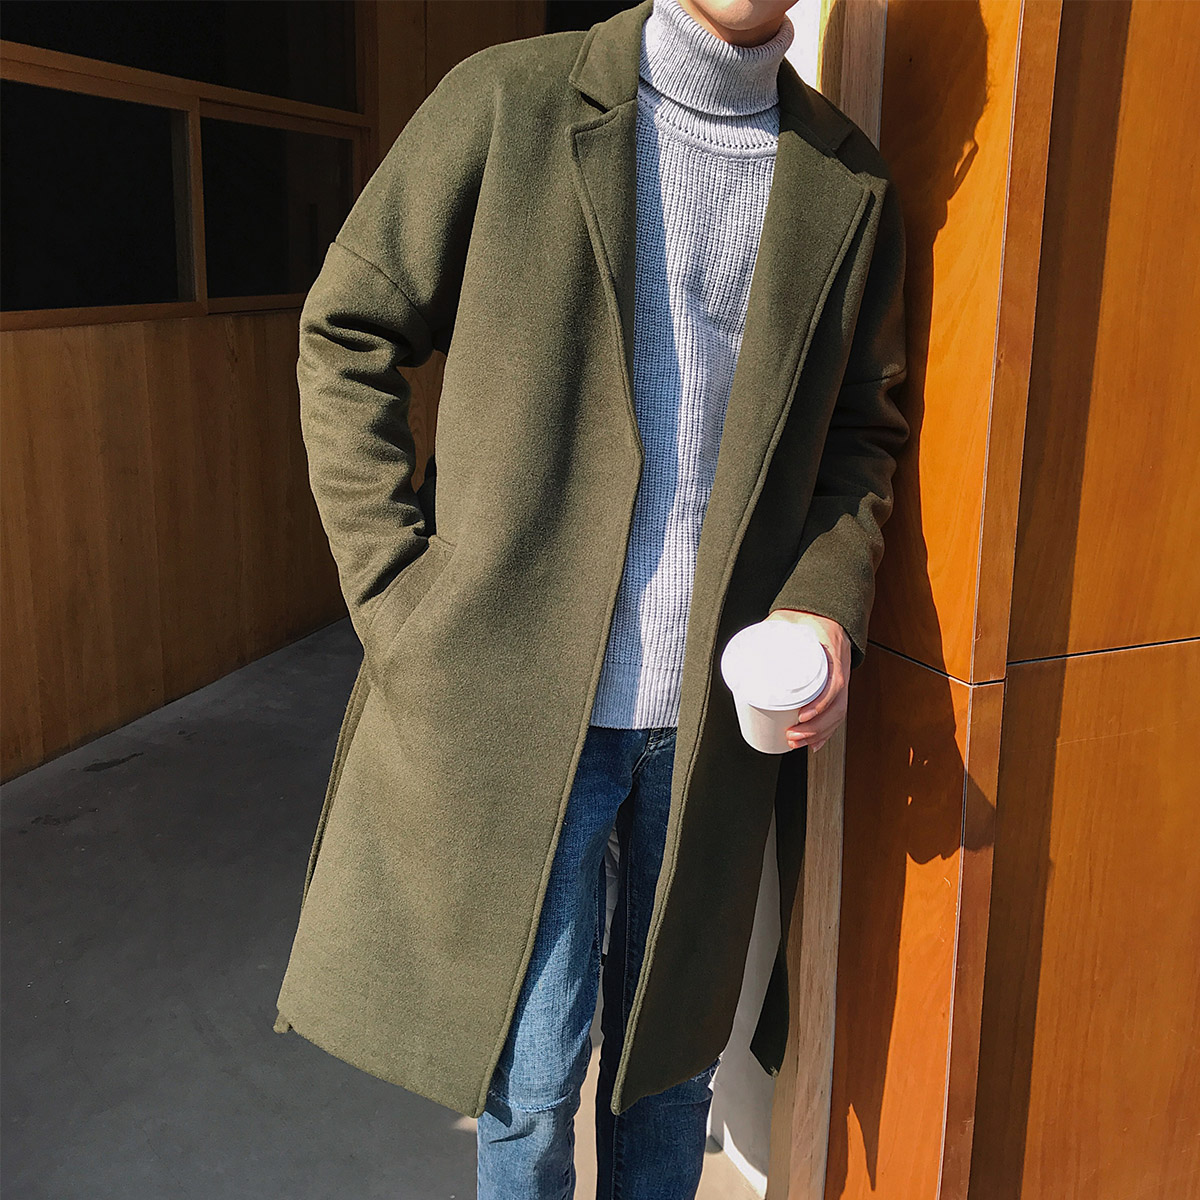 2018 New Autumn Winter Korean Fashion Trench Coat Men Oversize Drop Shoulder Long Windbreaker Men's Coat Thick Warm 1.5kg